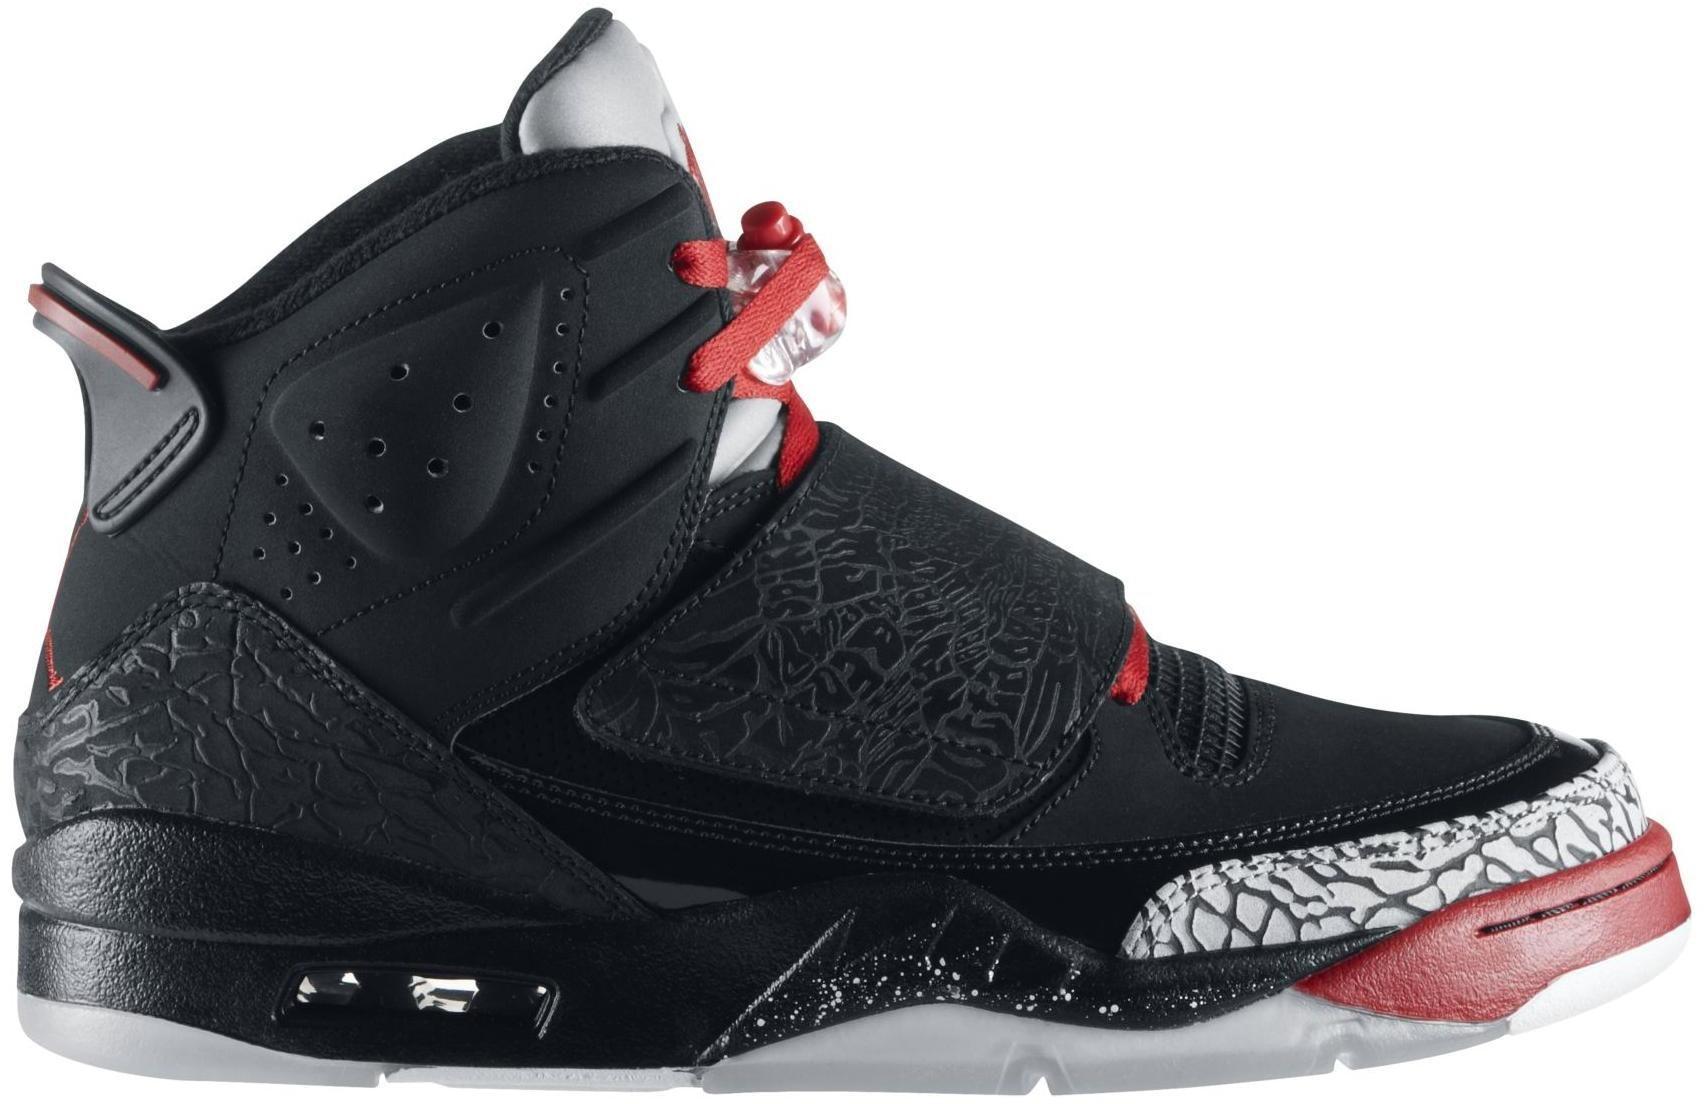 Jordan Son of Mars Black Cement